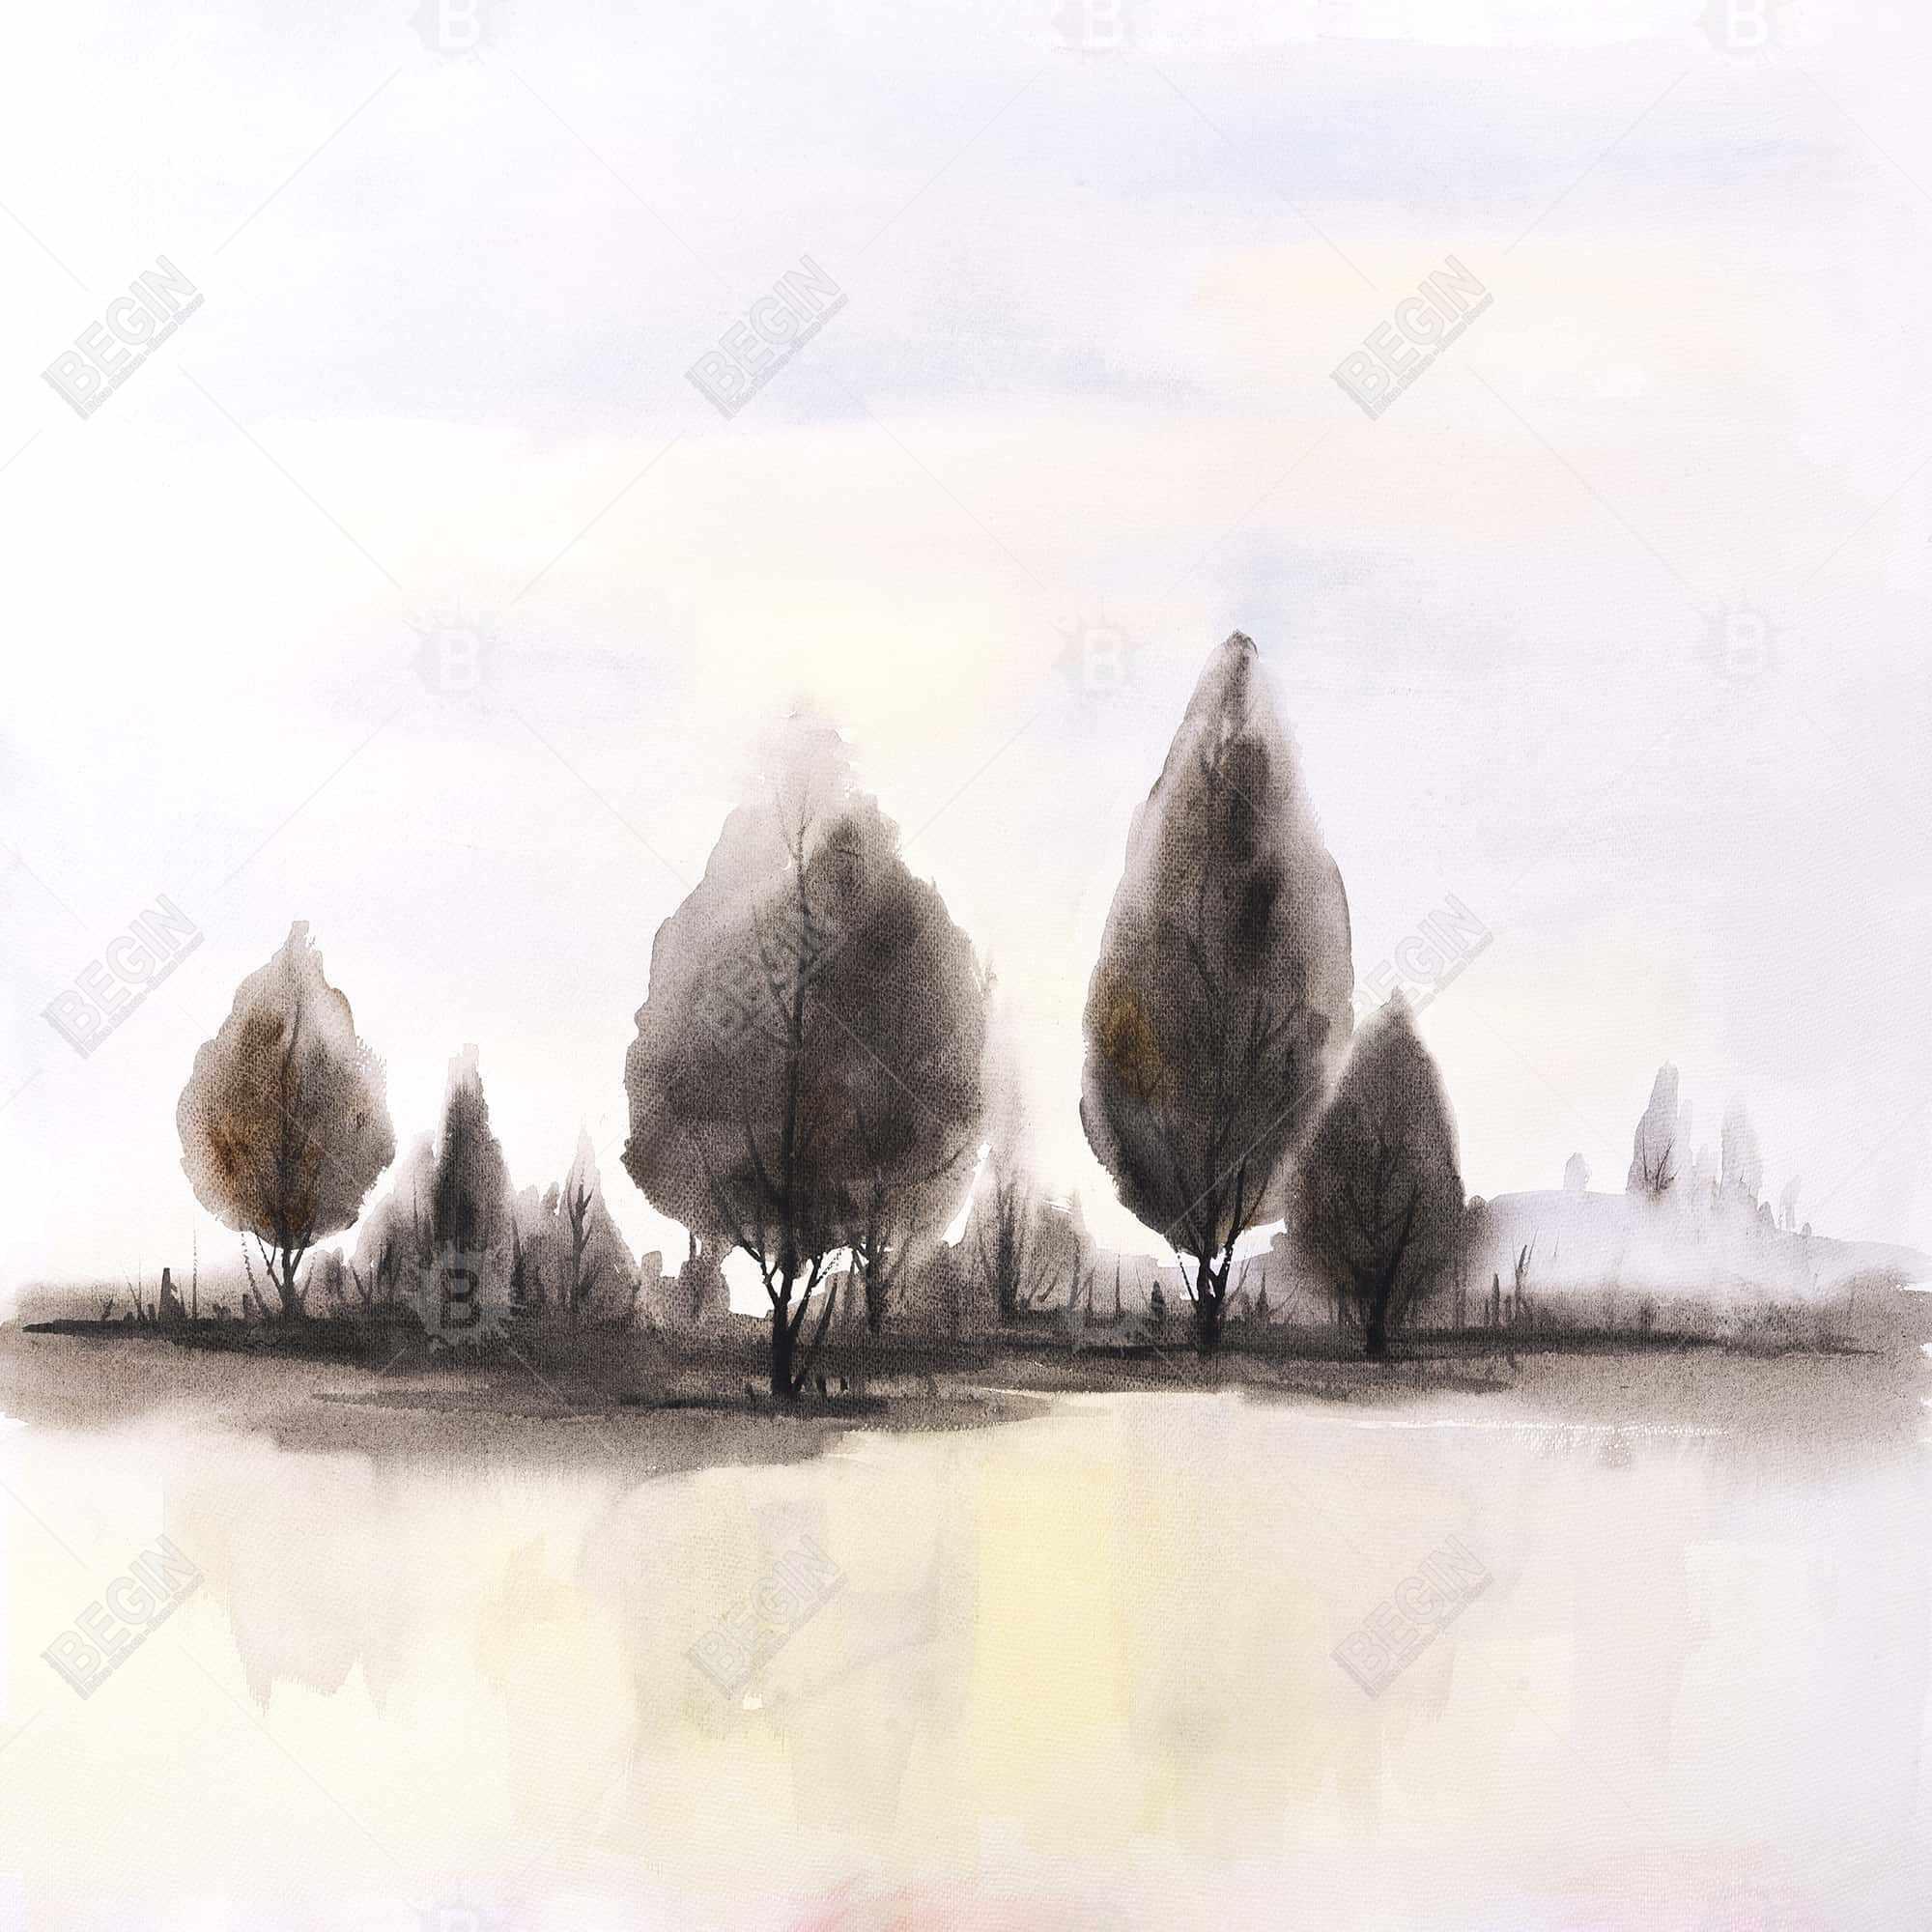 Landscape of trees